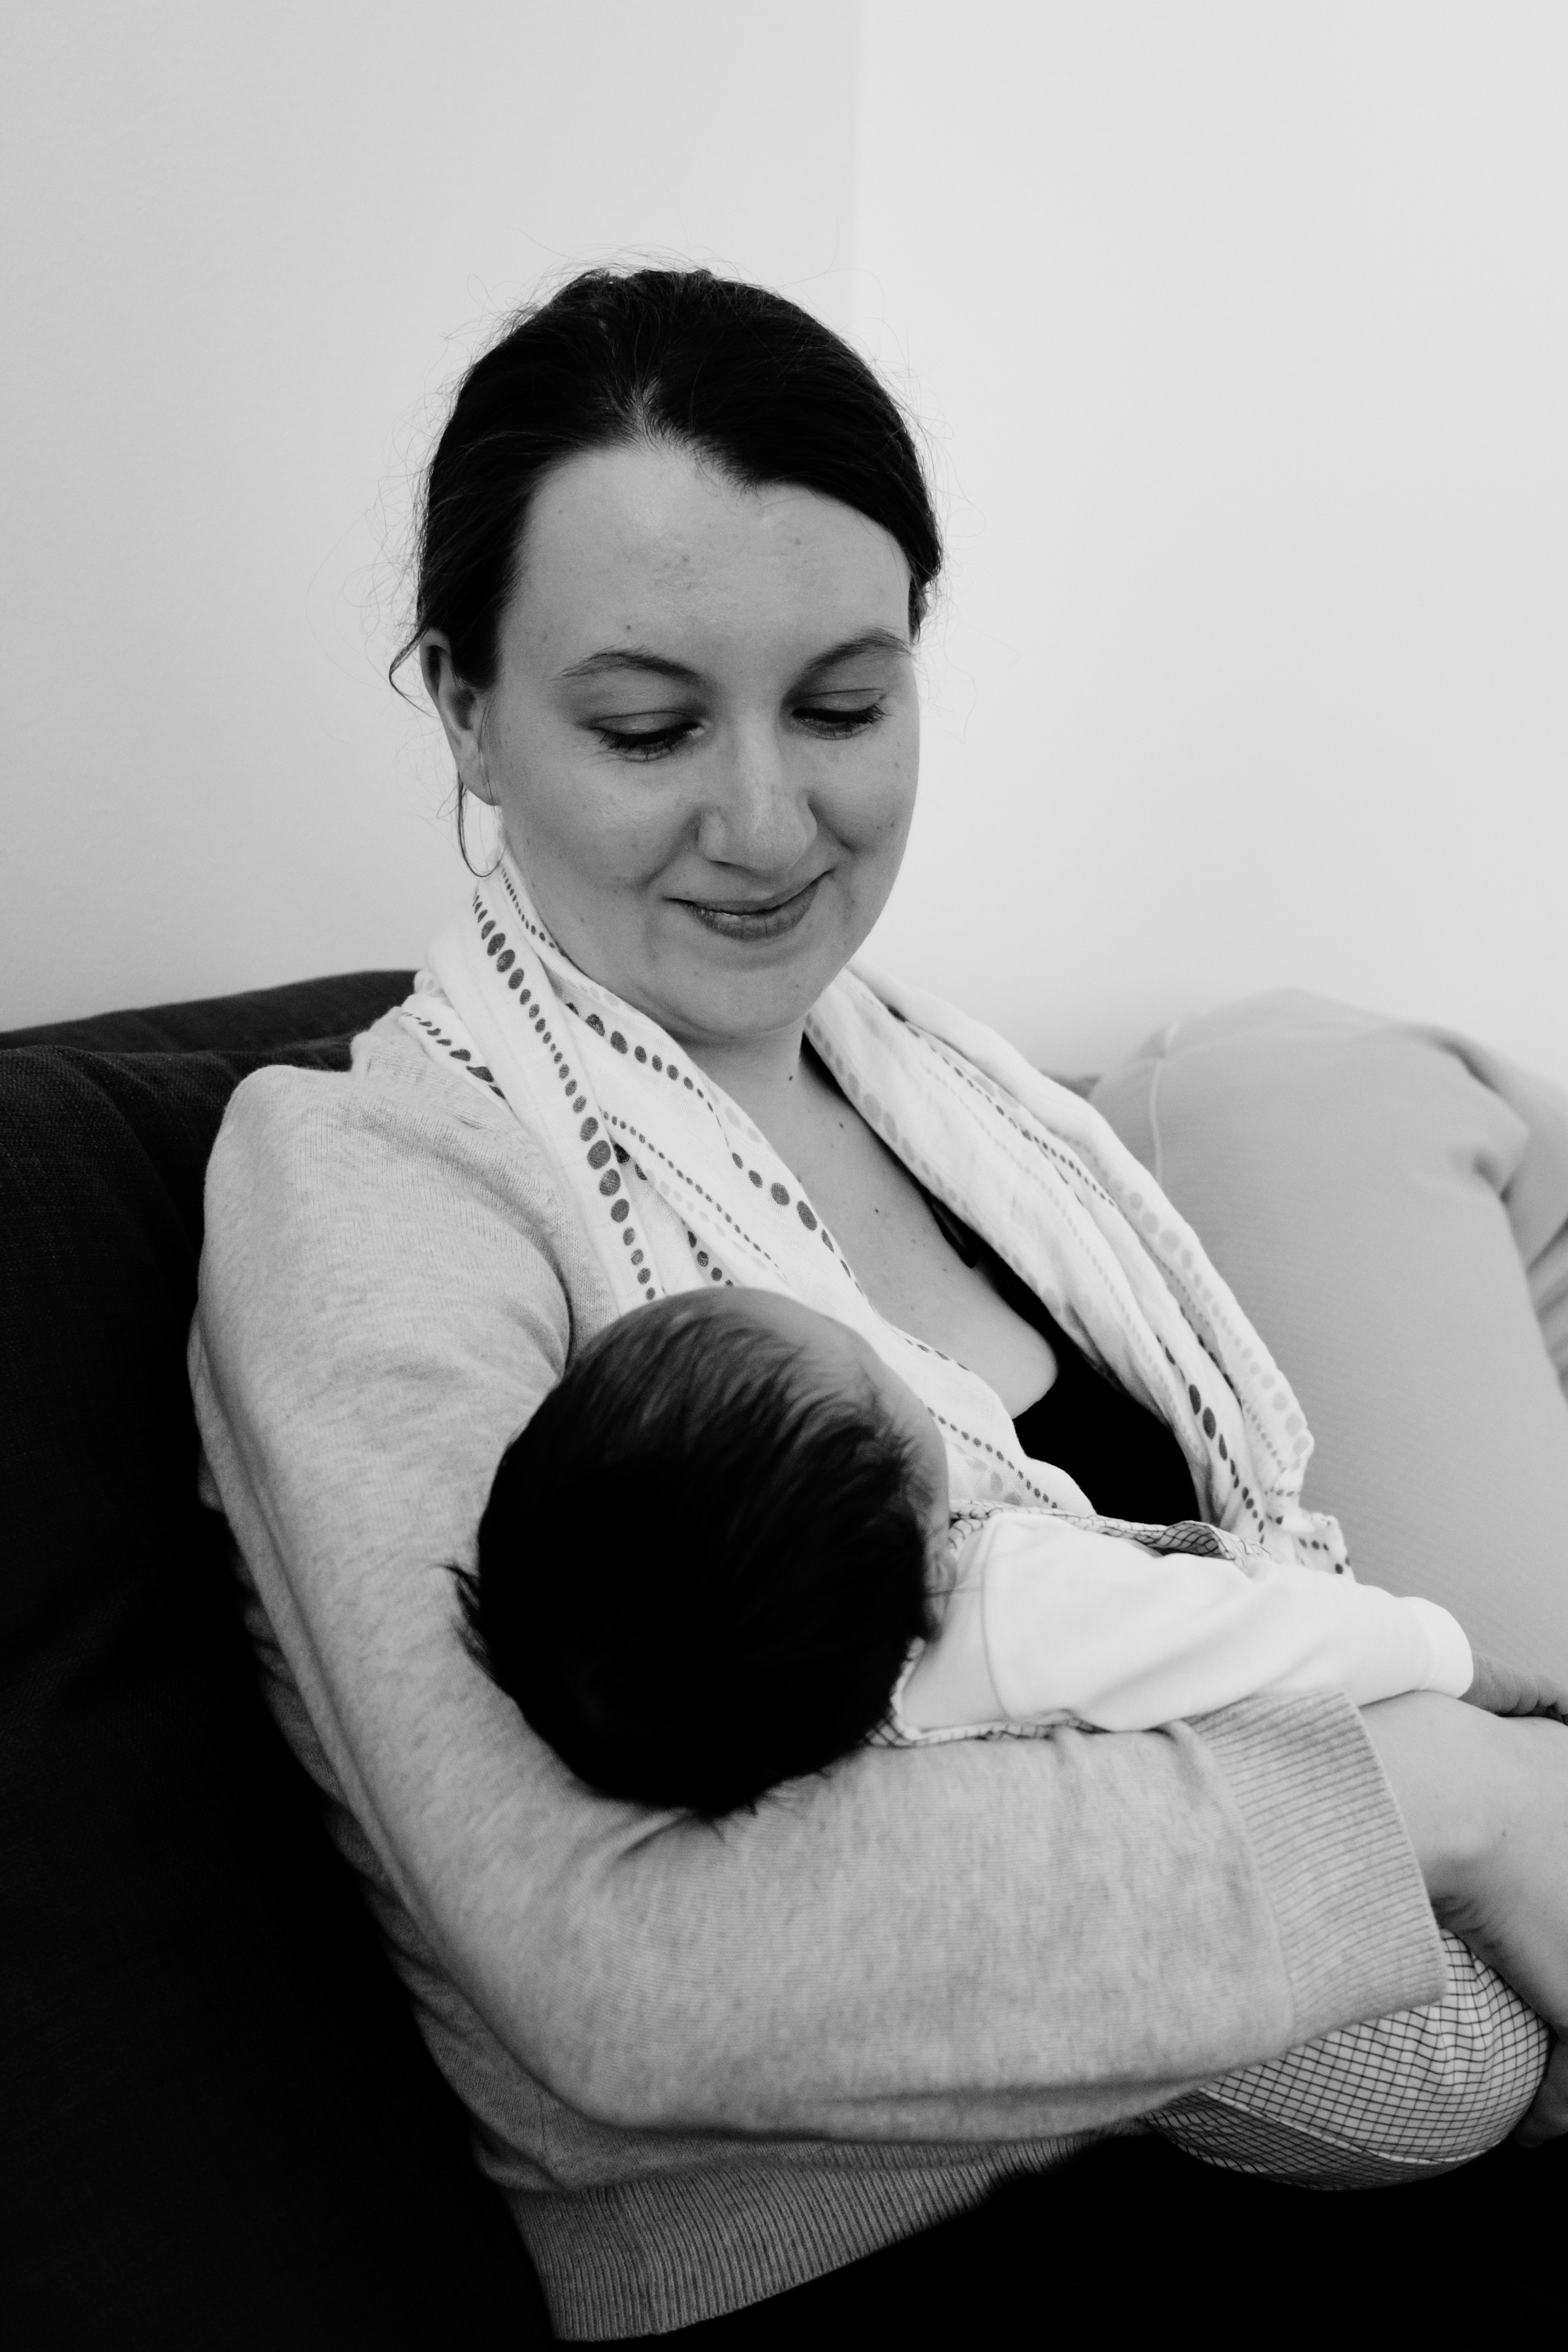 New mom gazes at newborn